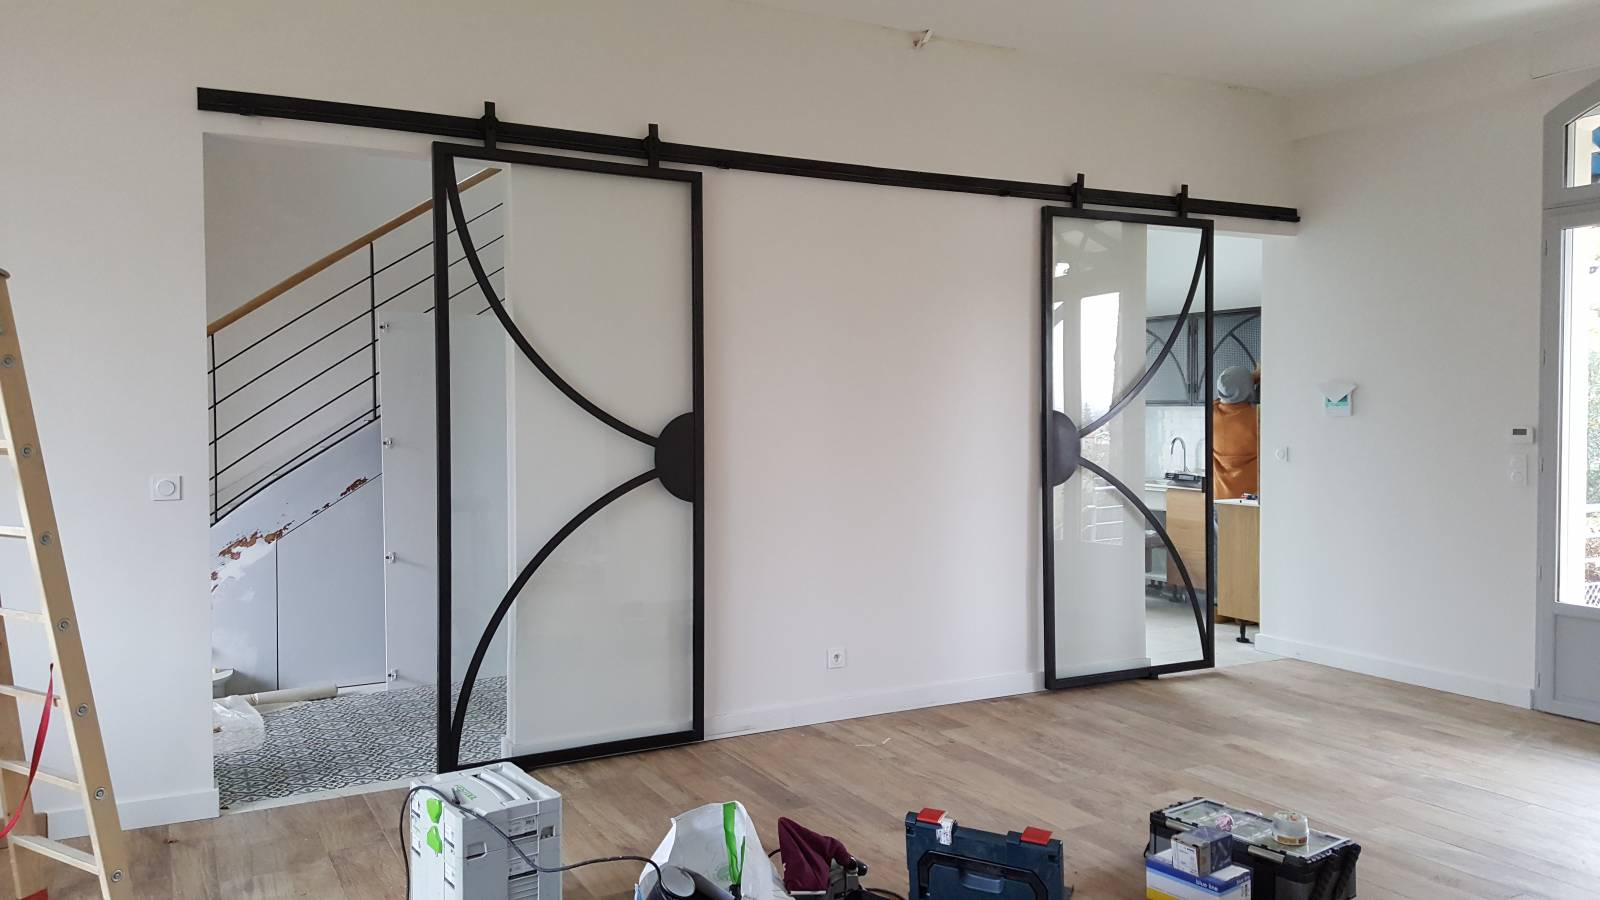 fabrication de verri res style industriel sur mesure. Black Bedroom Furniture Sets. Home Design Ideas